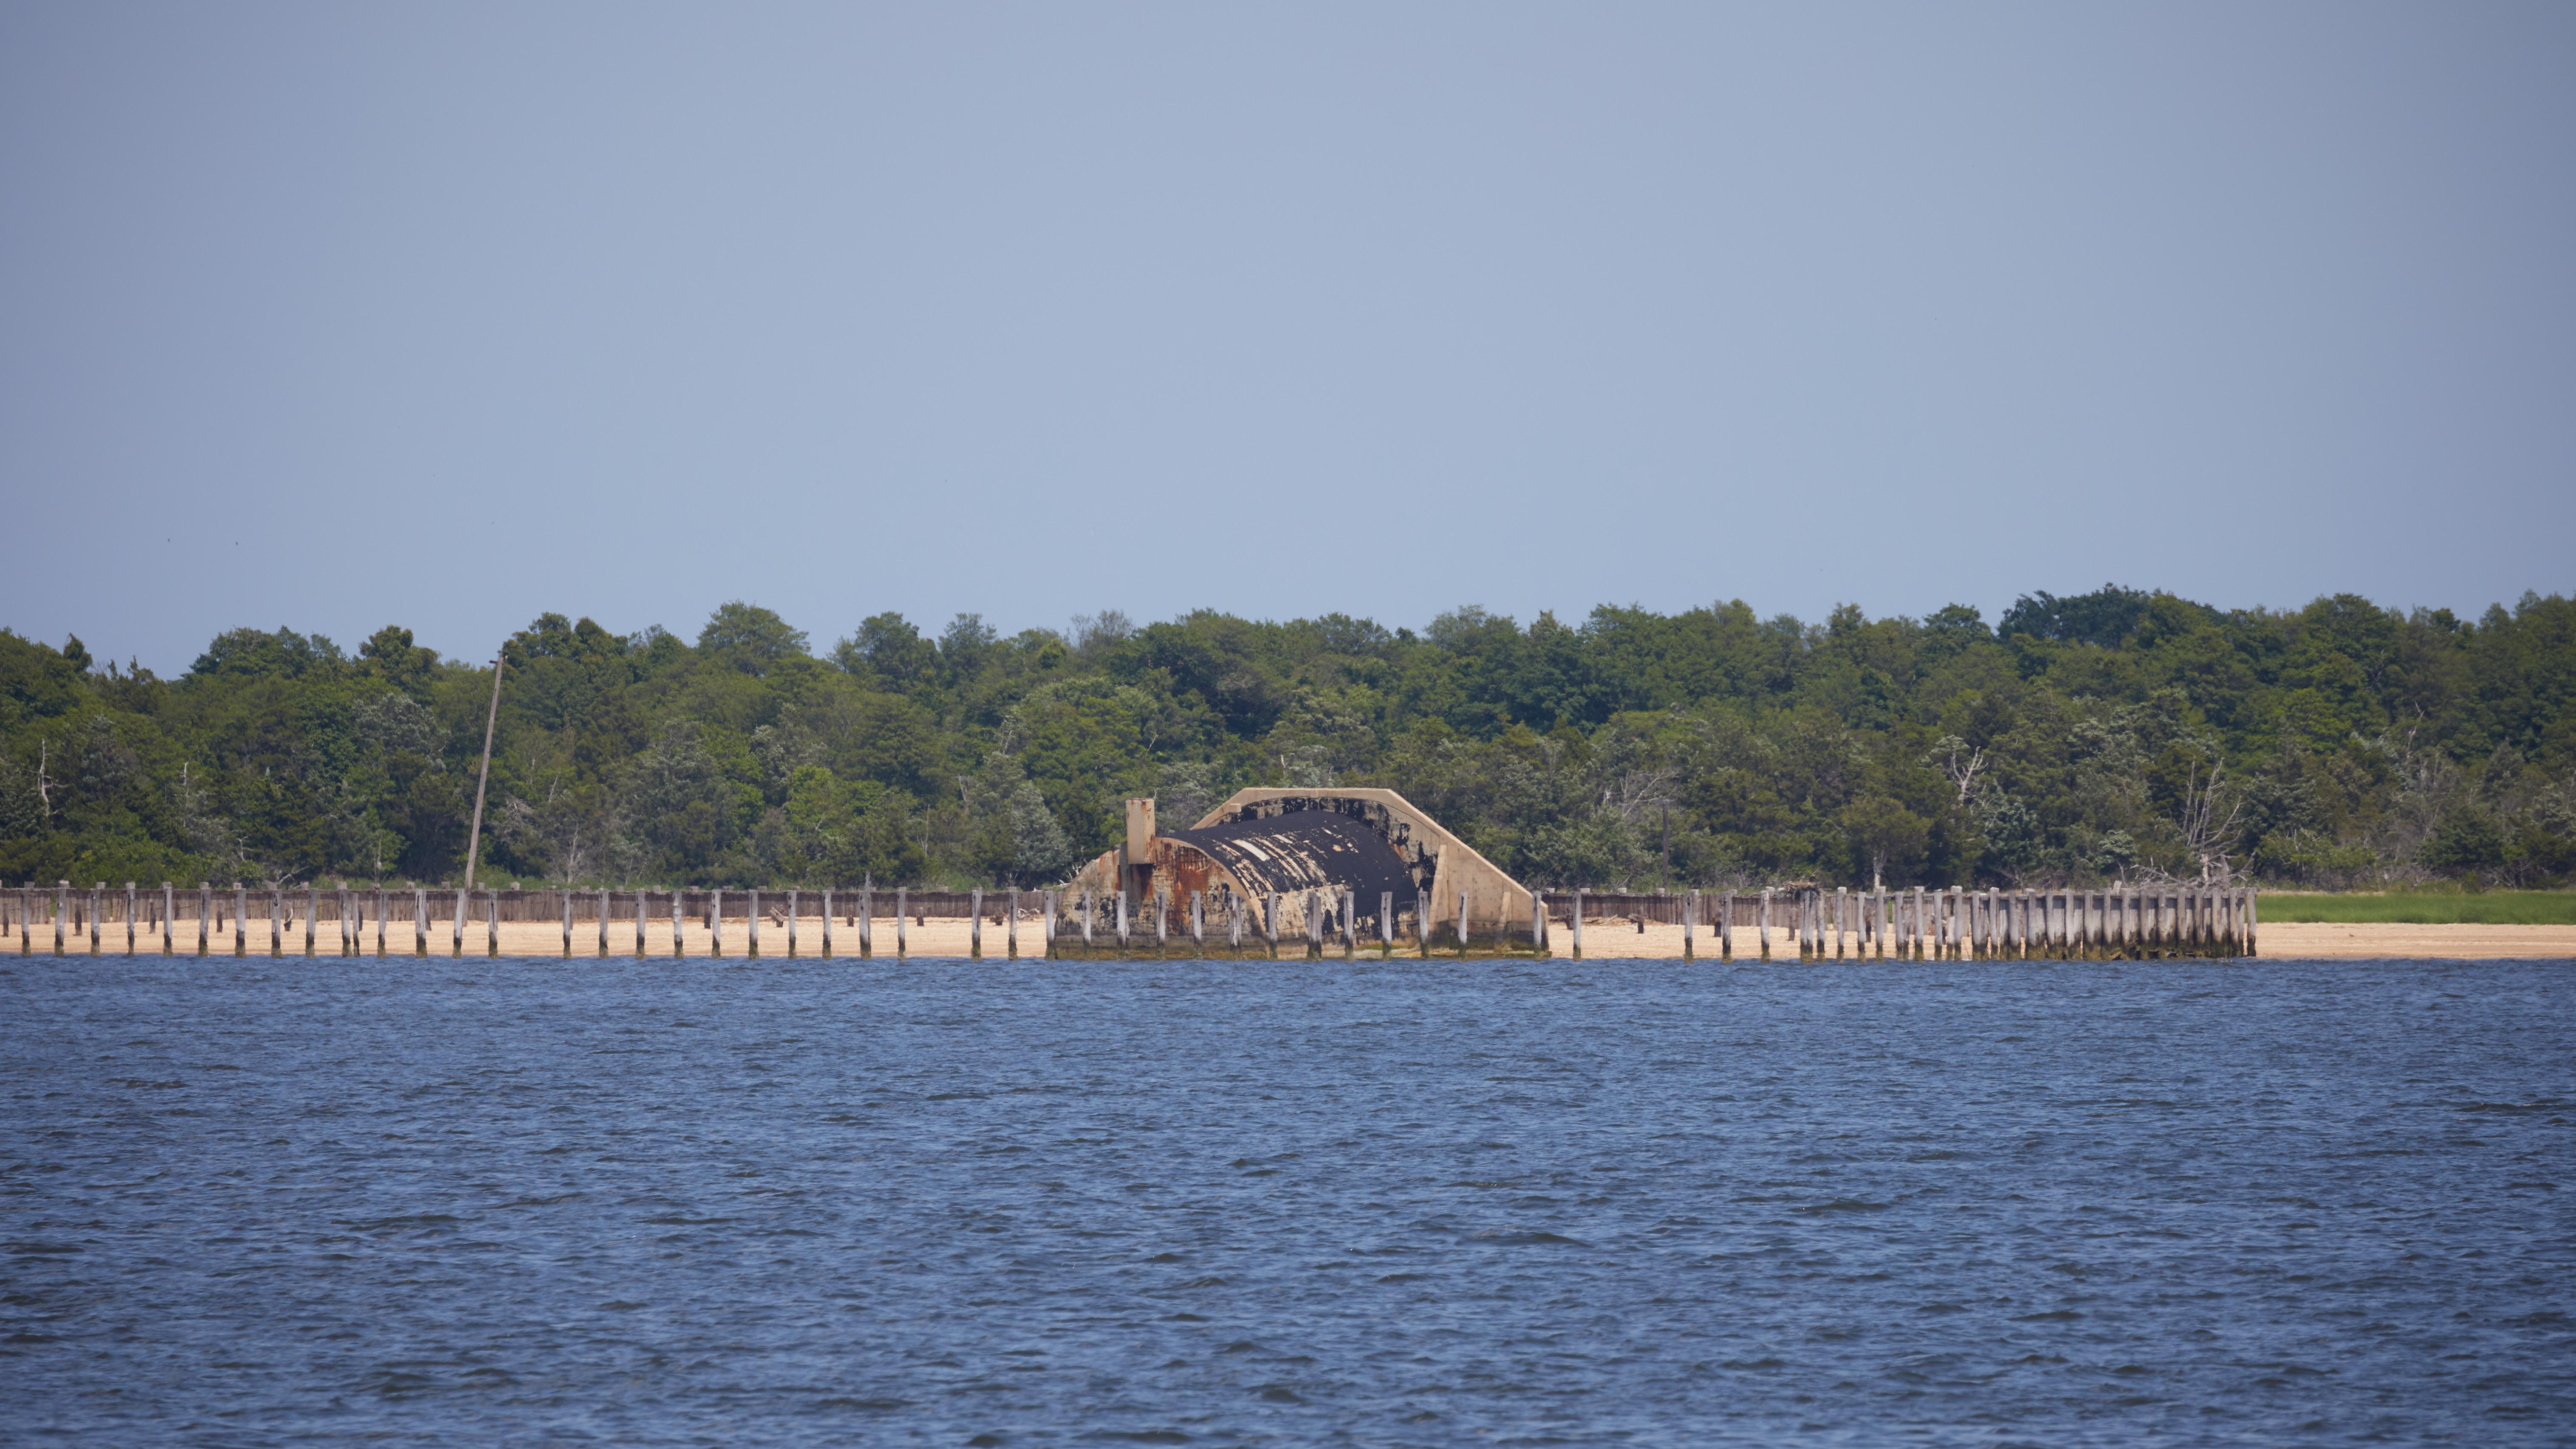 View of concrete bunker along shore of Sandy Hook.